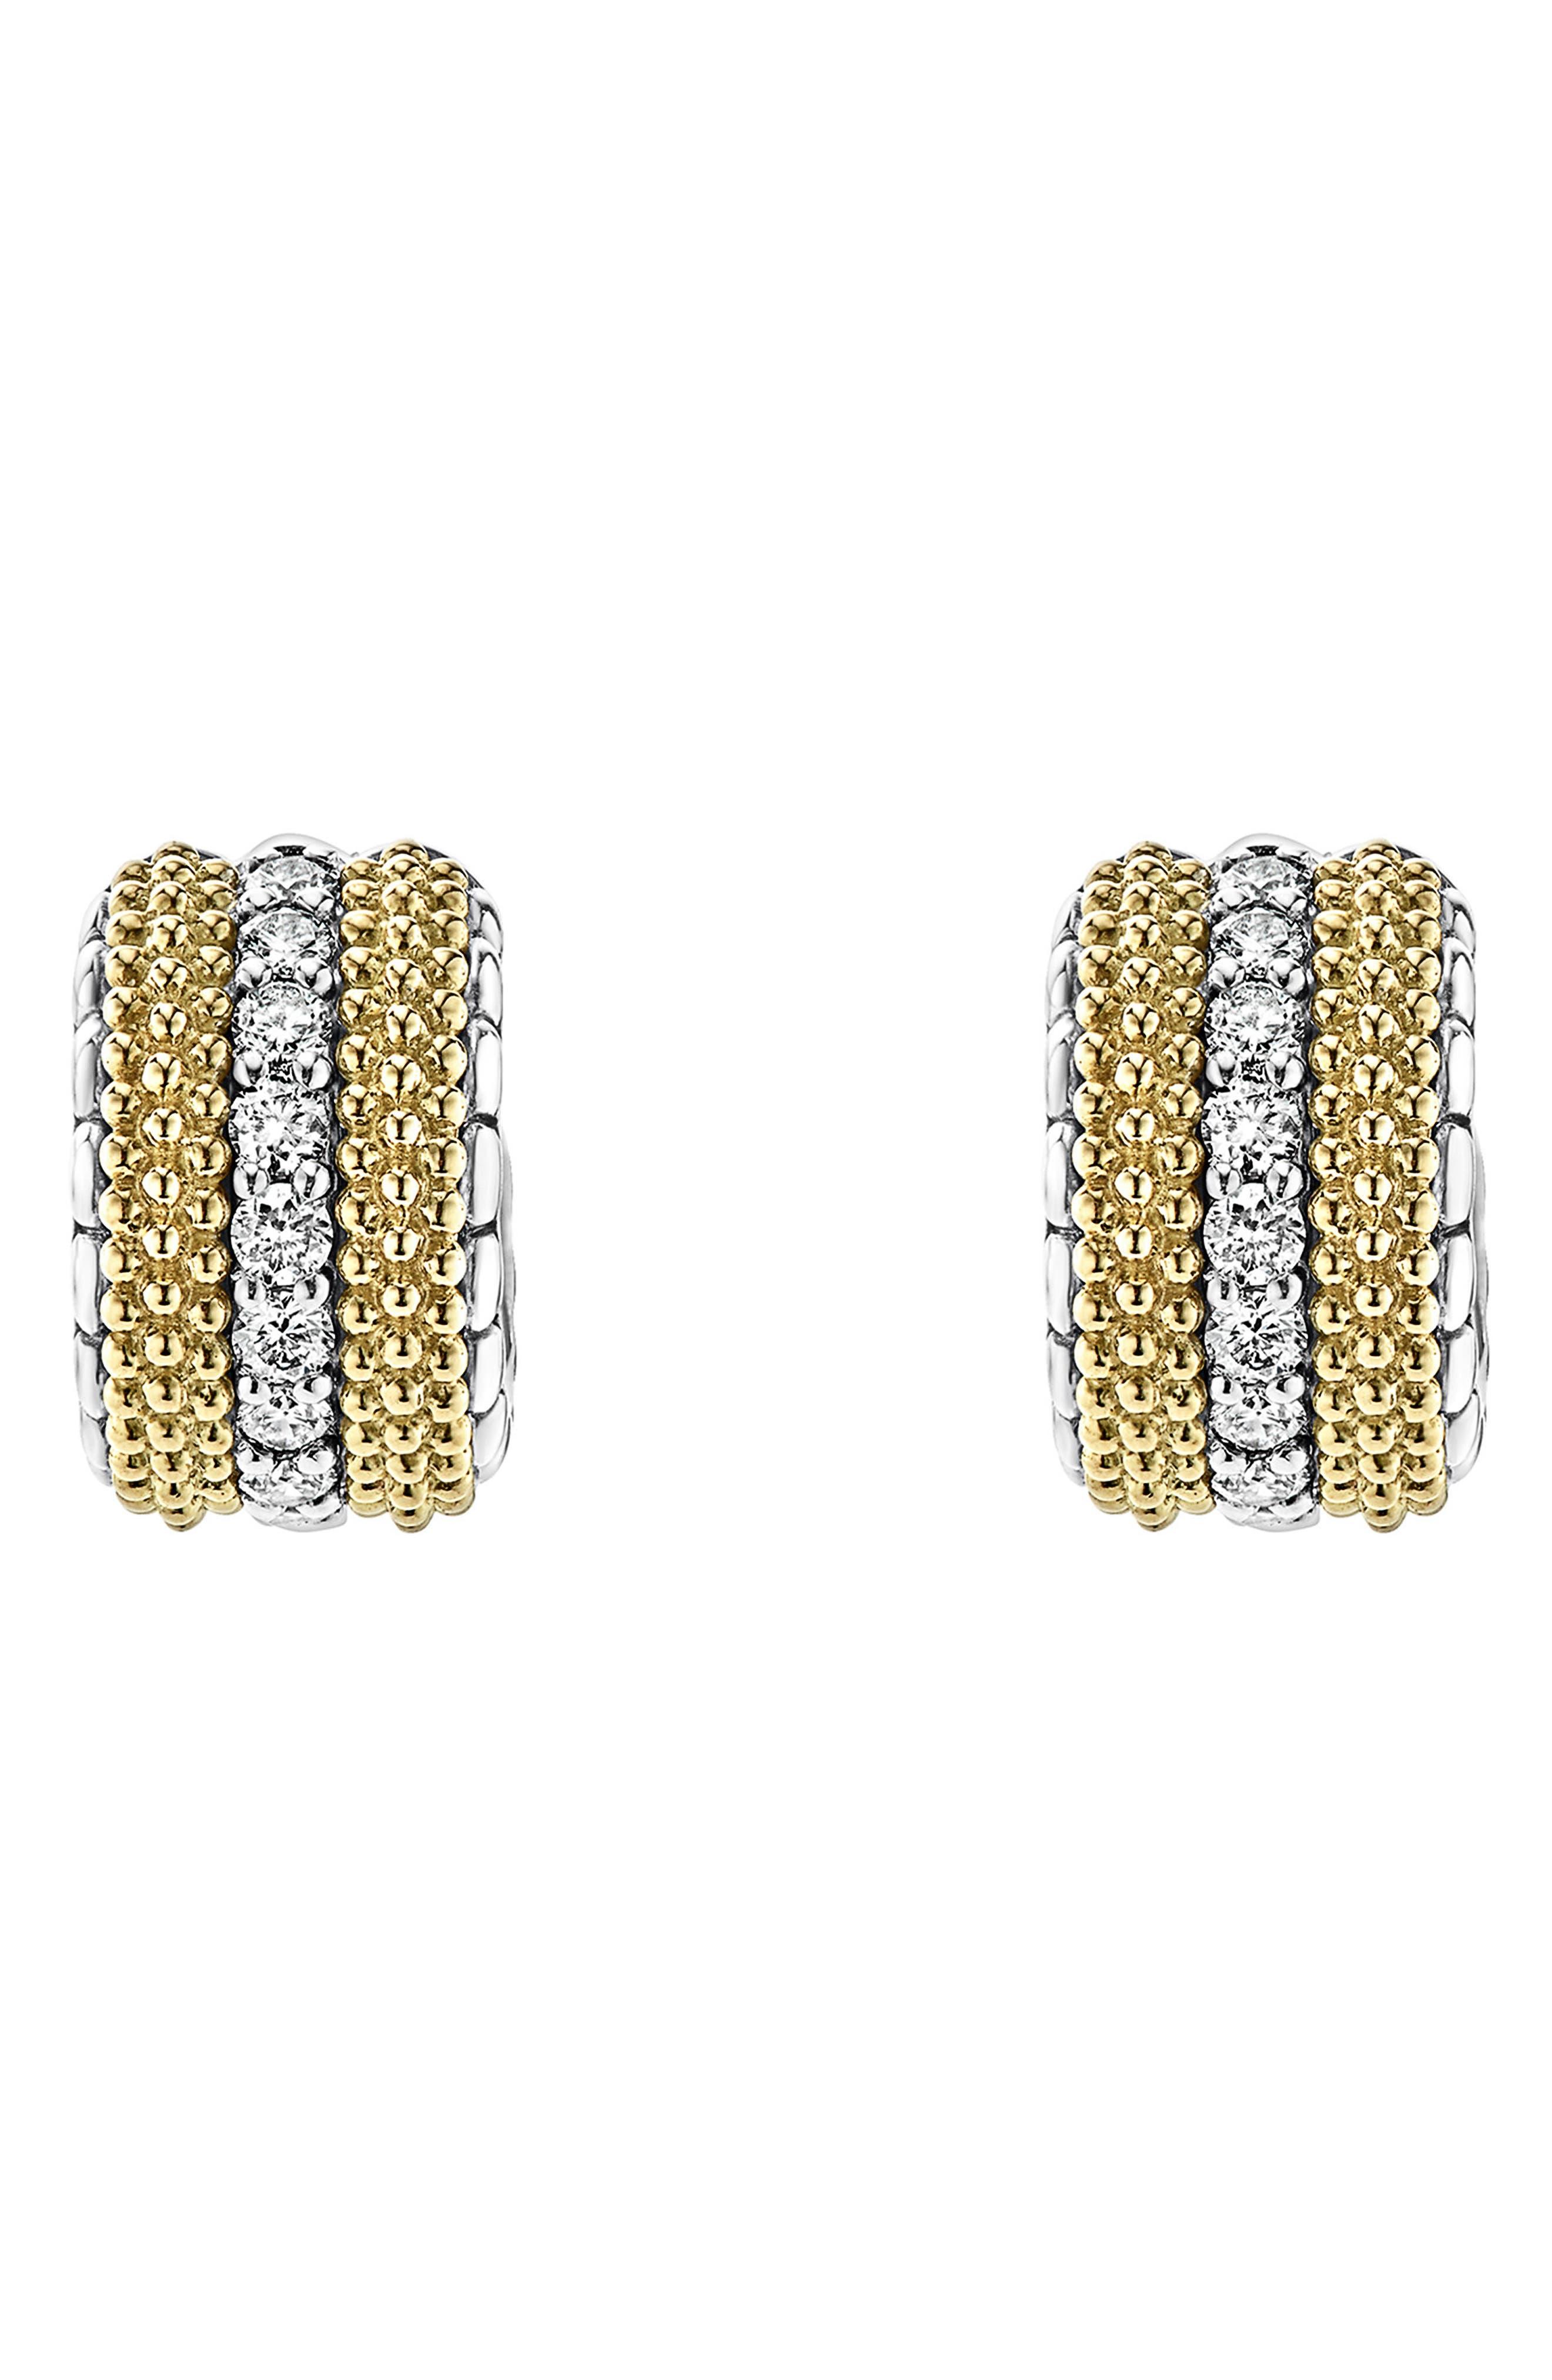 Lux Diamond Hoop Earrings,                             Main thumbnail 1, color,                             DIAMOND